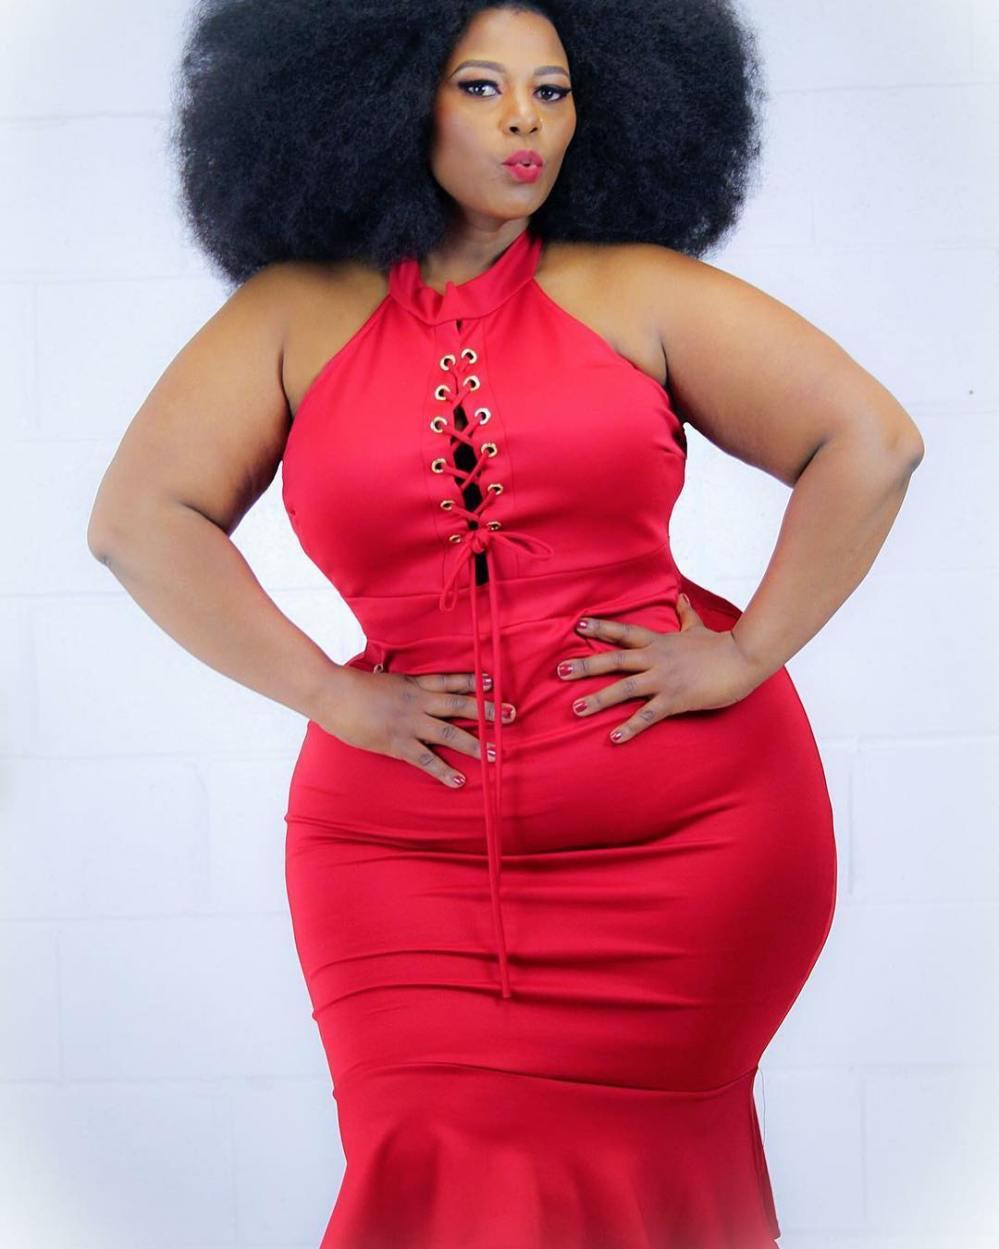 nakitende-esther_curvy-crush-wednesday_theafricanista.com (4).jpg